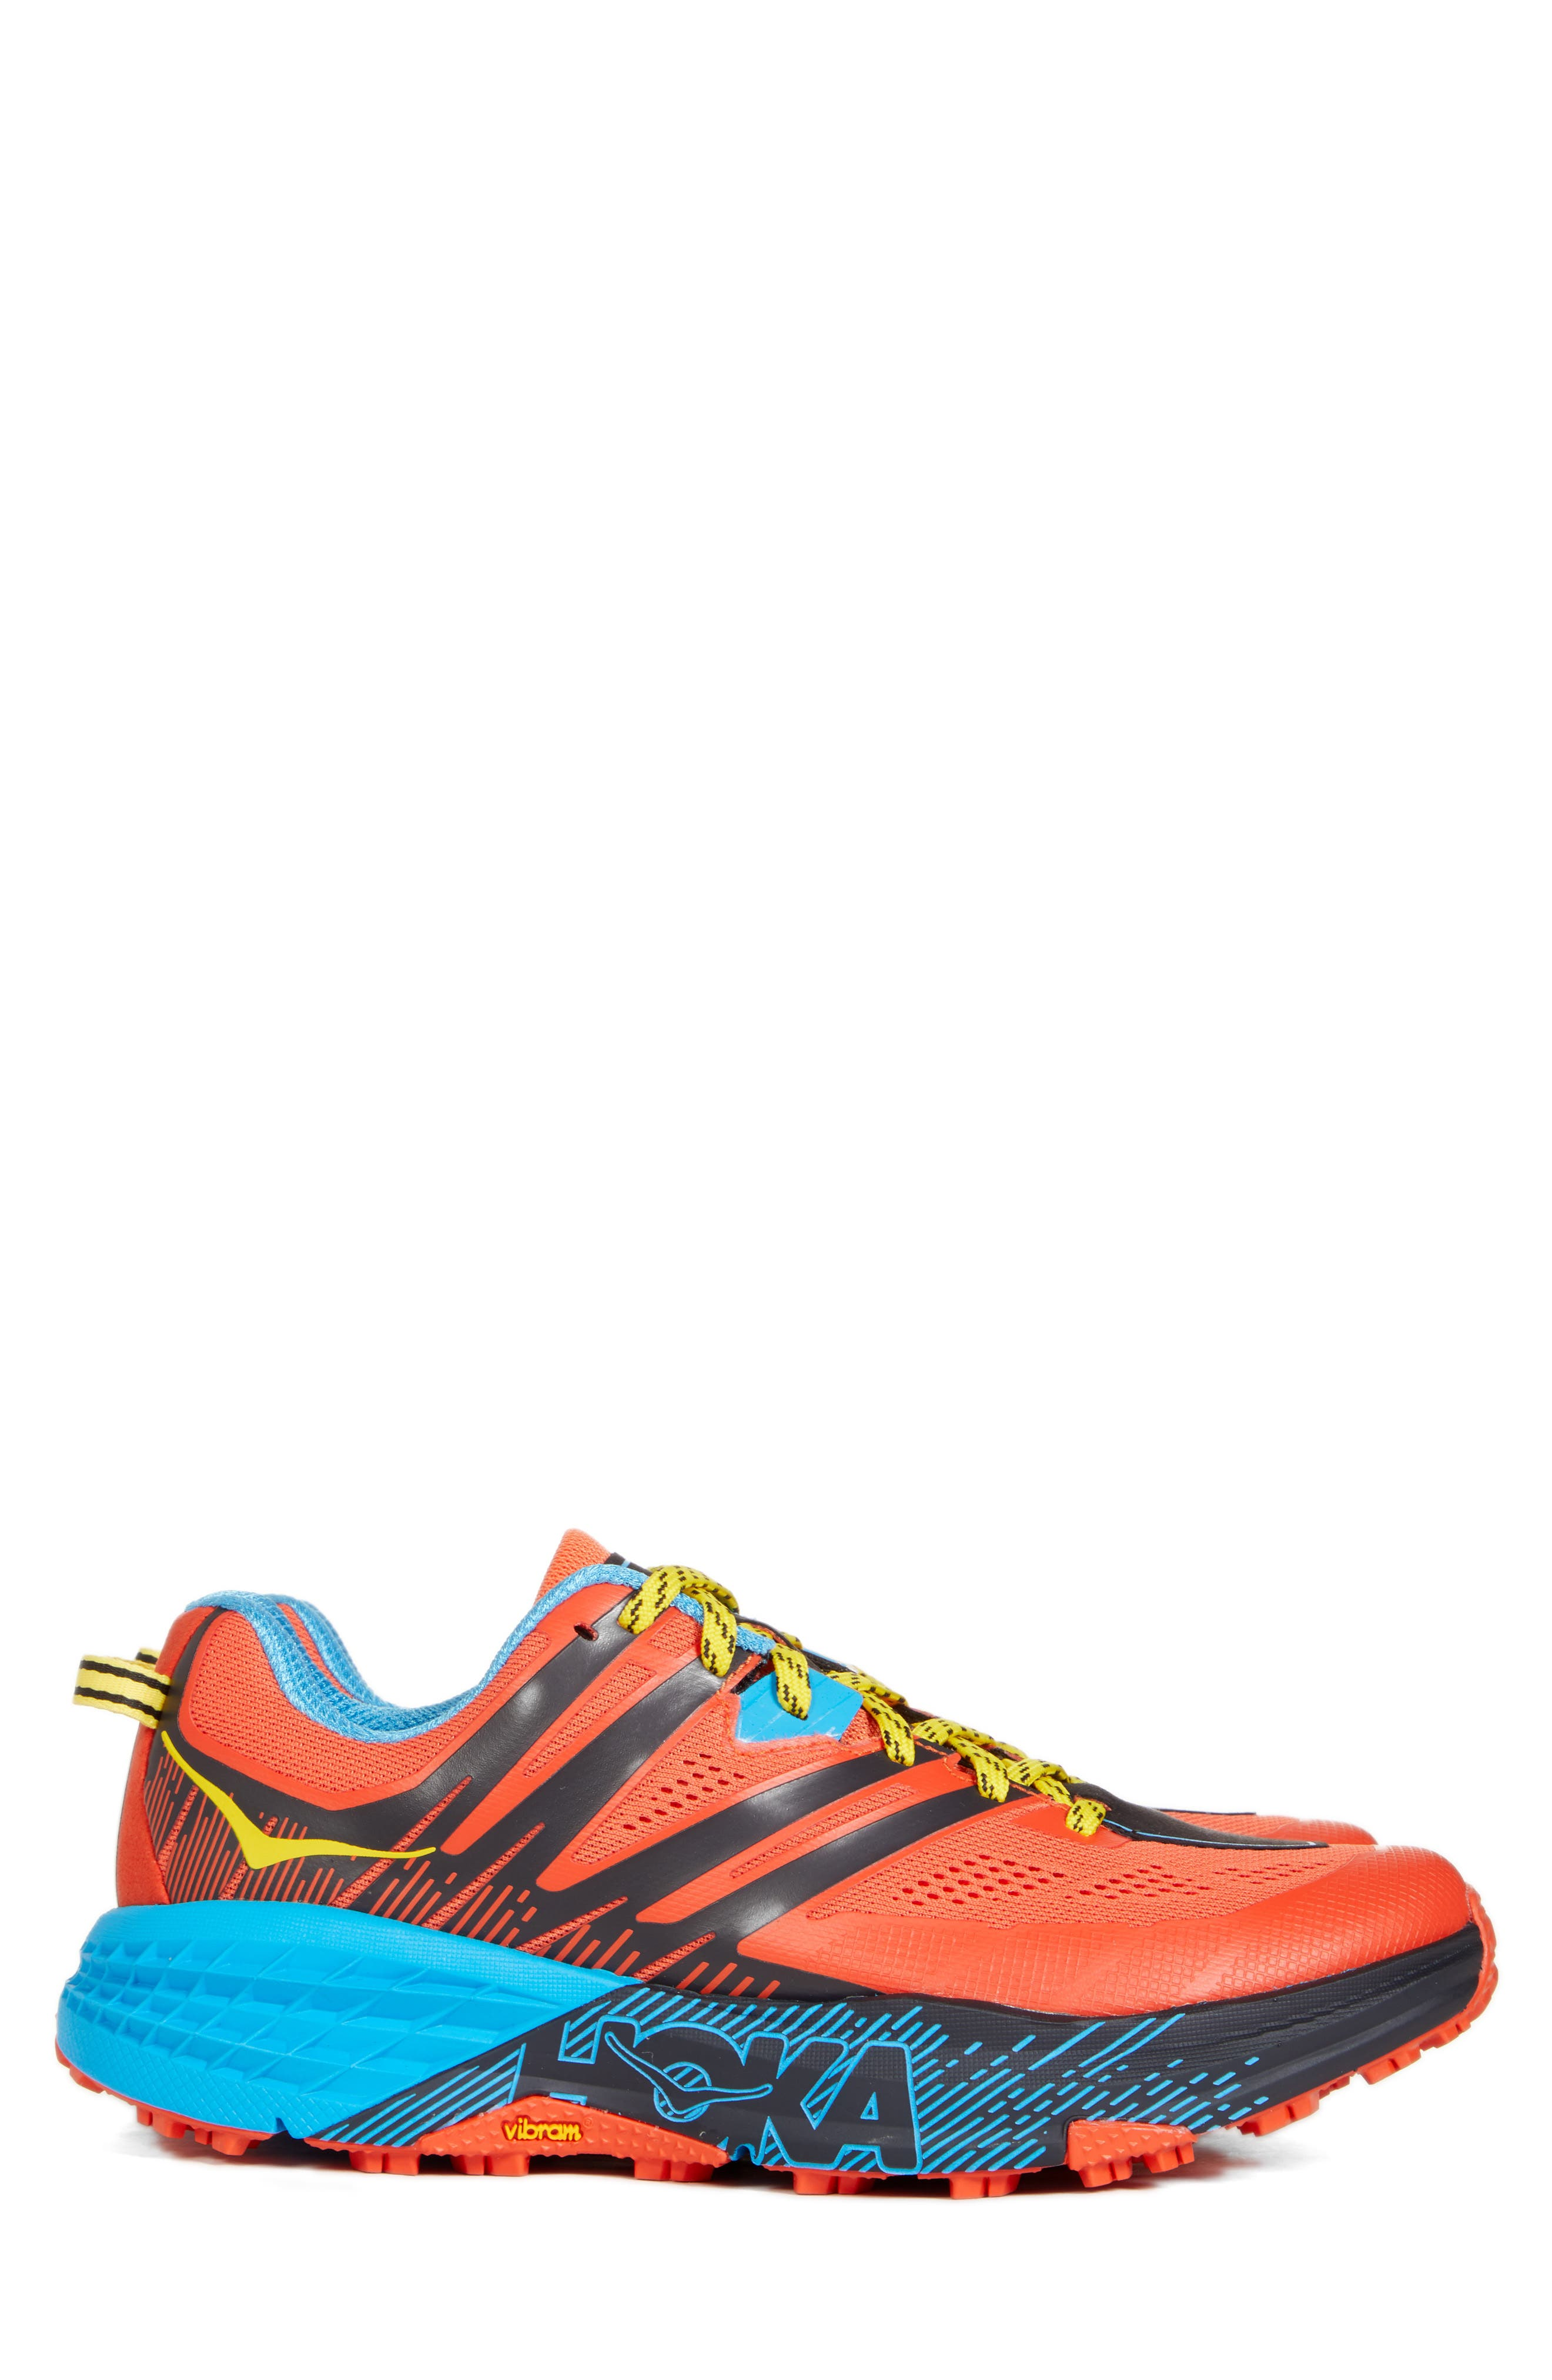 Speedgoat 3 Trail Running Shoe,                             Main thumbnail 1, color,                             NASTURTIUM/ SPICY ORANGE